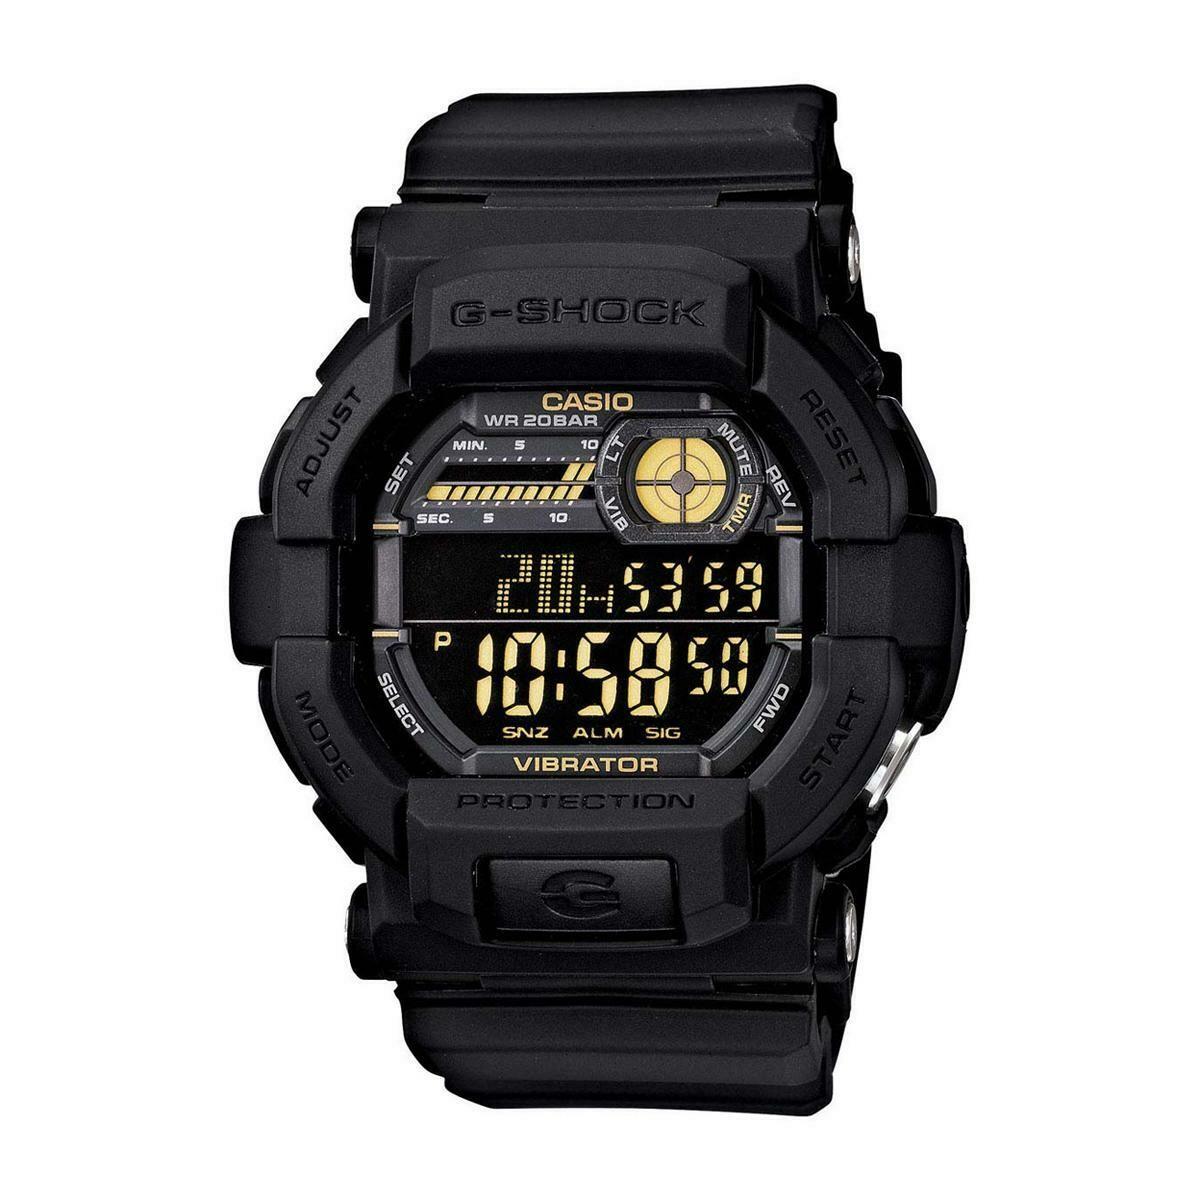 Casio G-Shock GD-350-1BDR Digital Watch for Men -Black